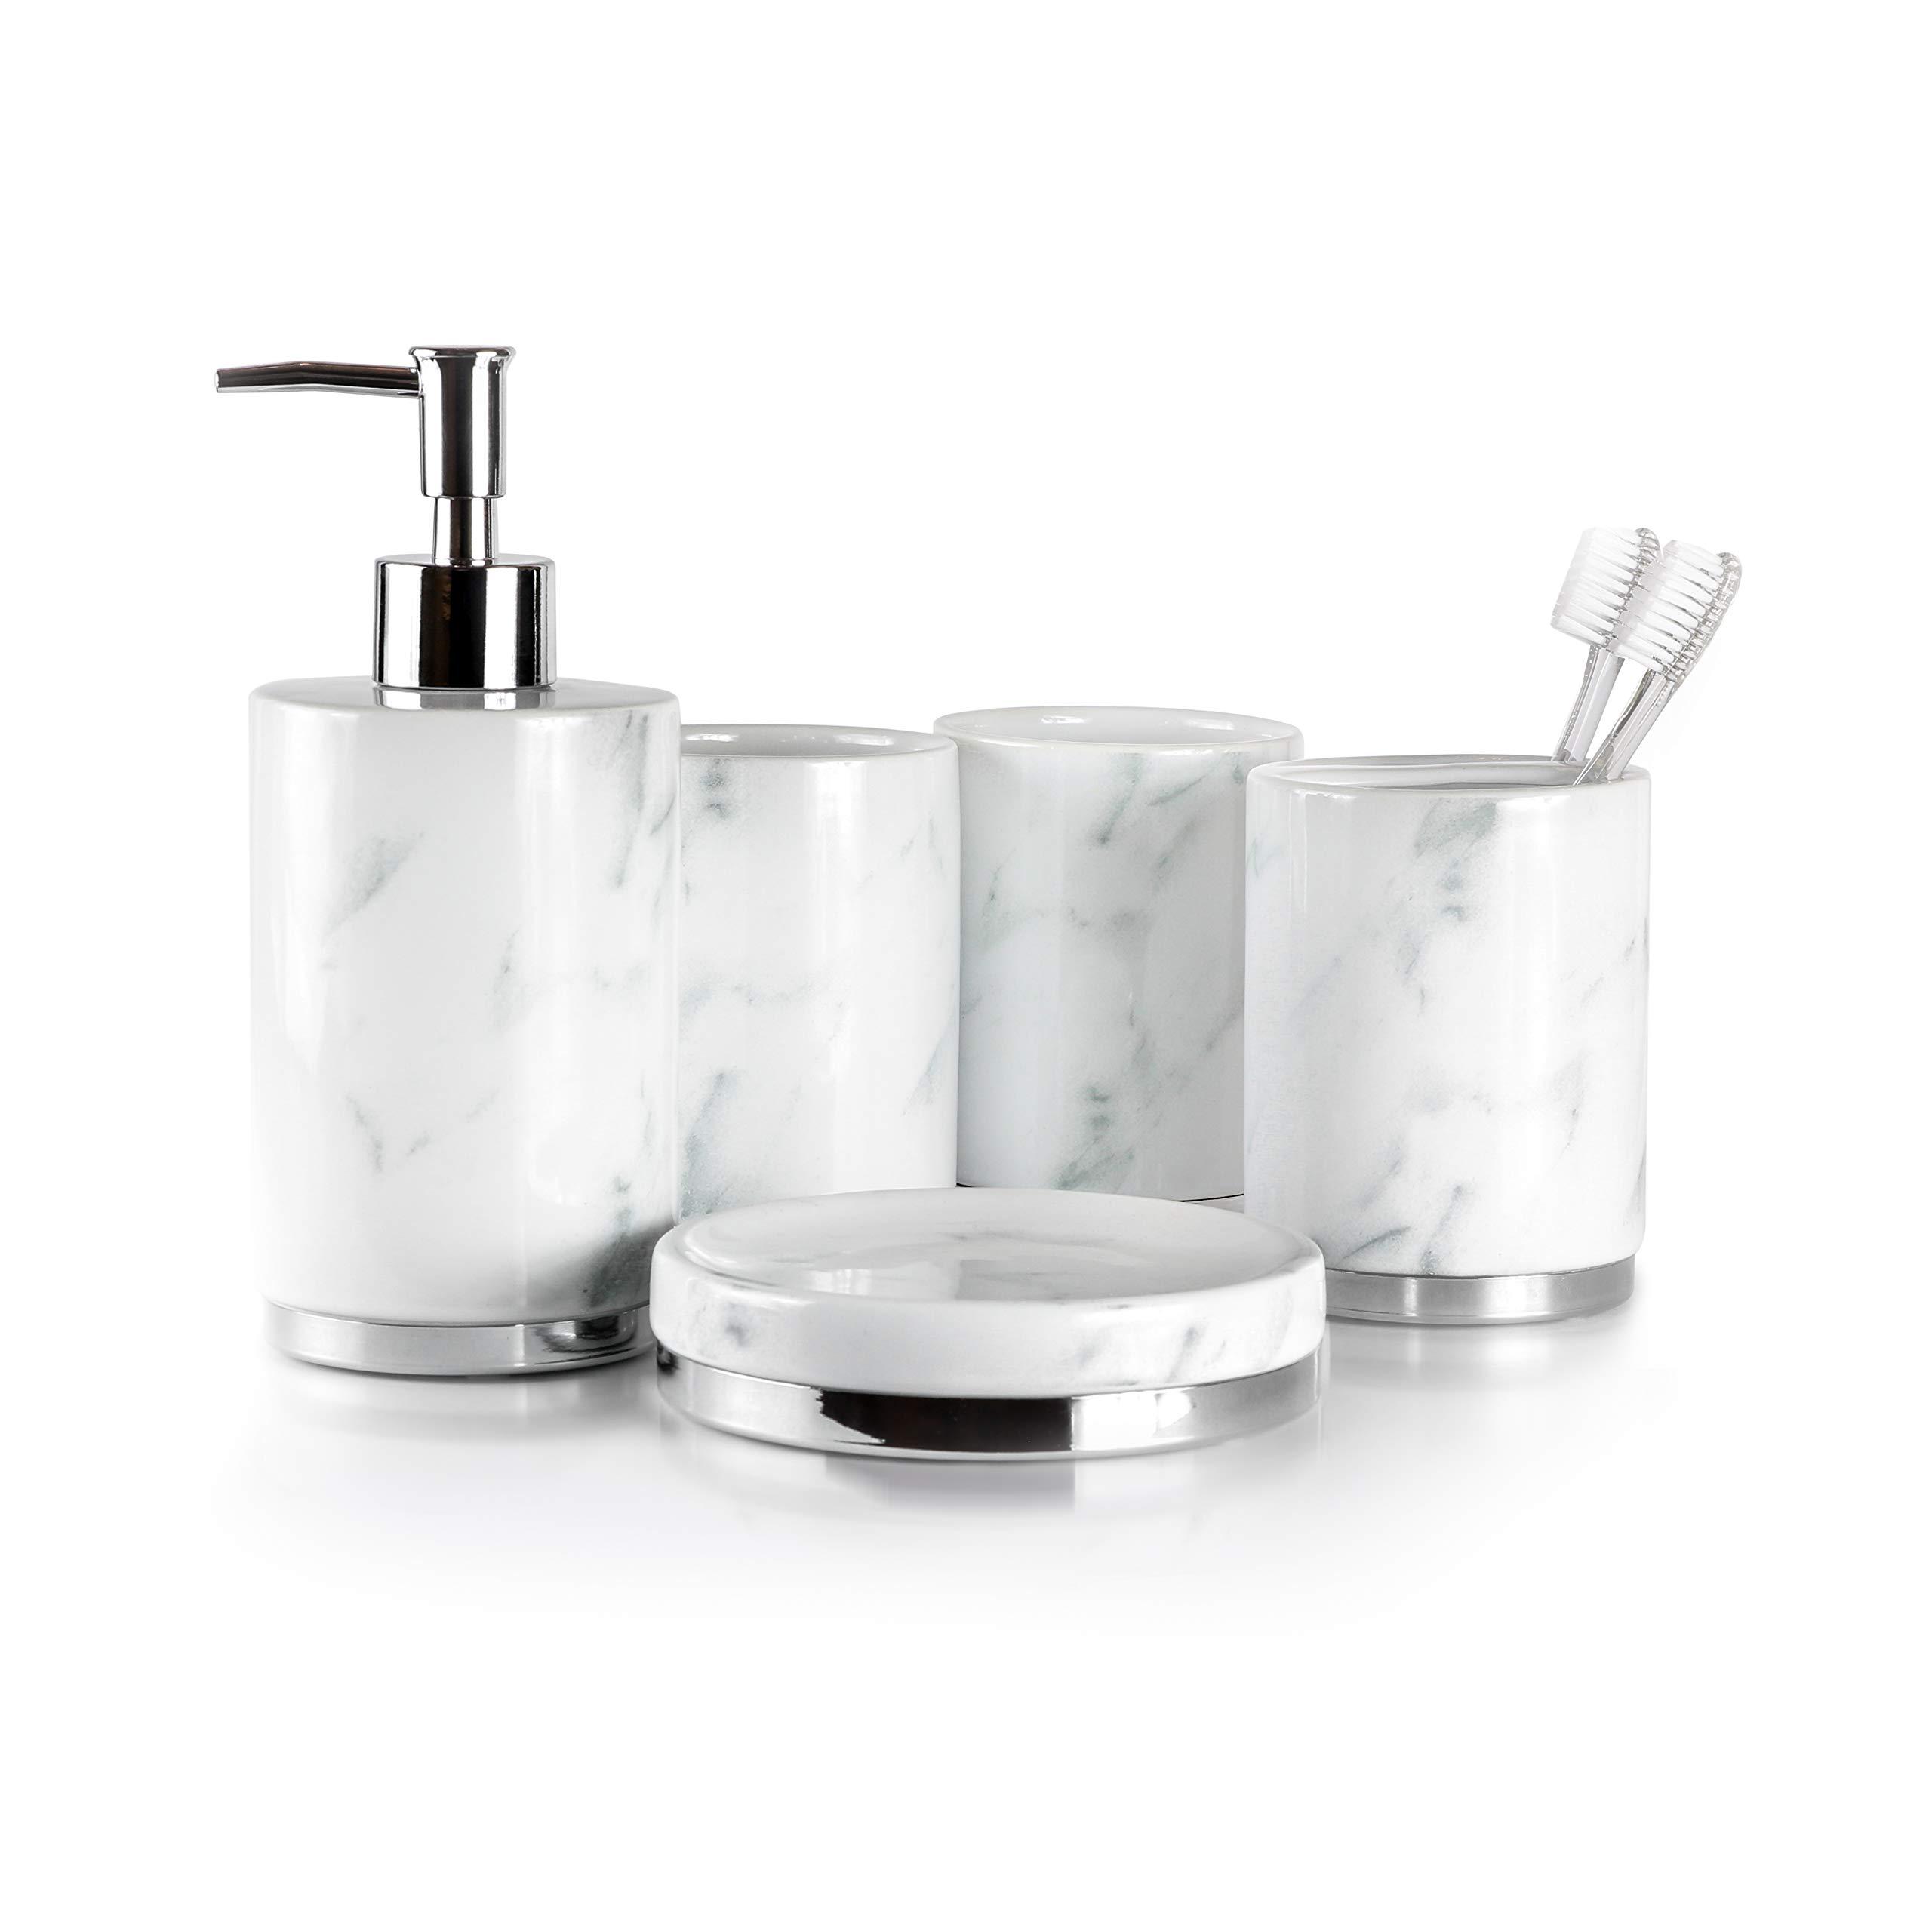 Willow&Ivory Bathroom Accessories Set | 5 Piece, Ceramic Bath Set | Toothbrush Holder, Soap Dispenser, Soap Dish, 2 Tumblers